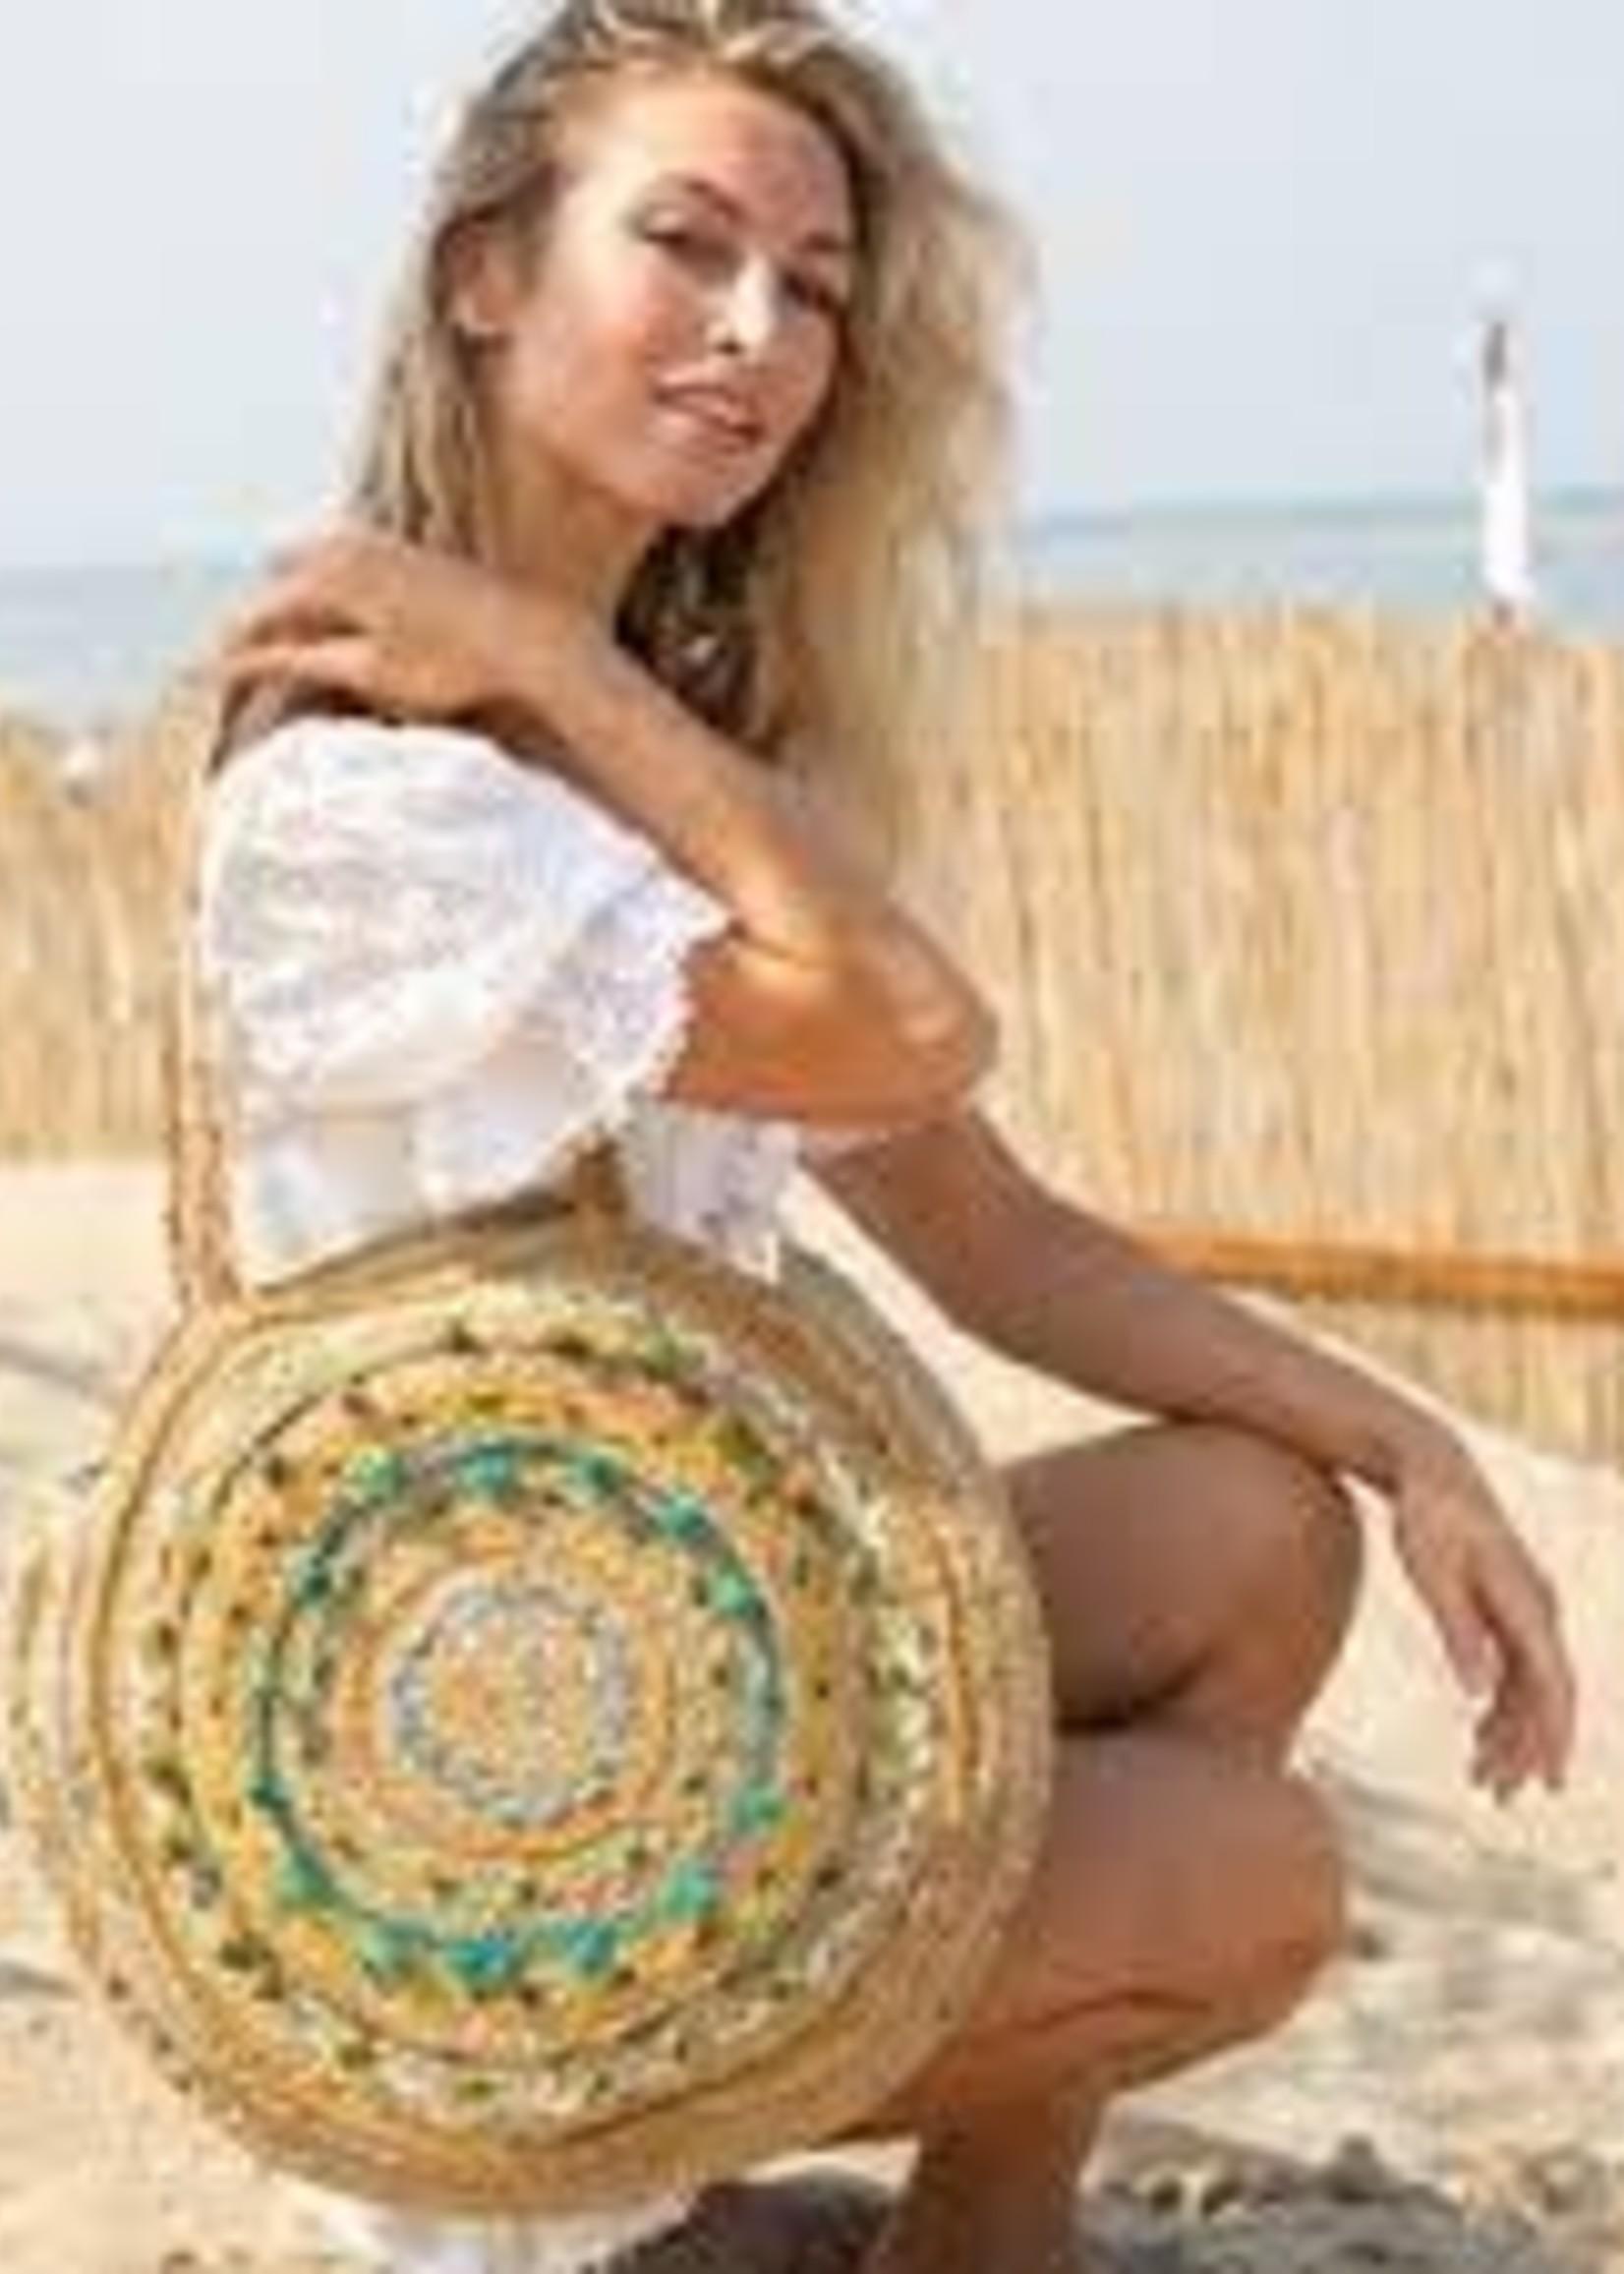 Mycha Ibiza Mycha - Ibiza - Jute ronde tas Cala - Bassa 4